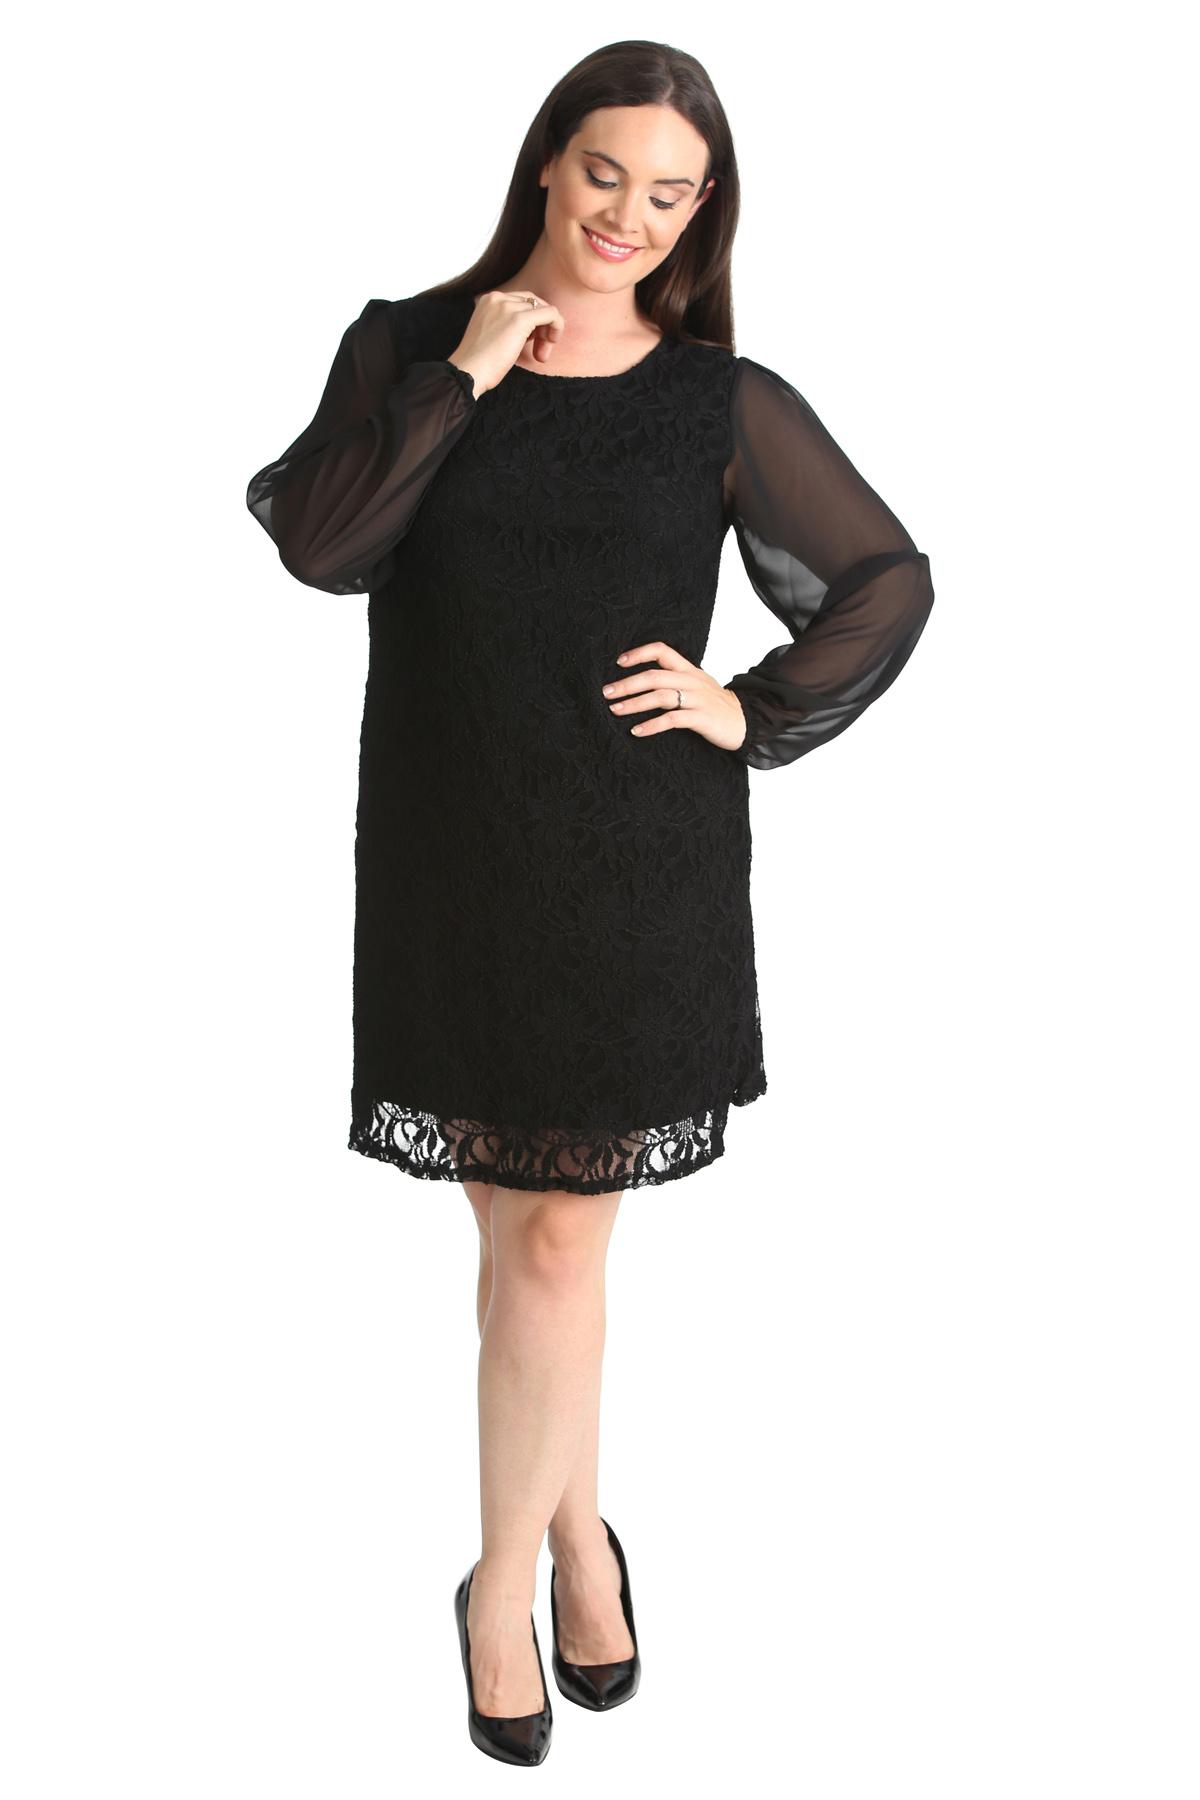 New Ladies Dress Plus Size Womens Floral Lace Chiffon ...